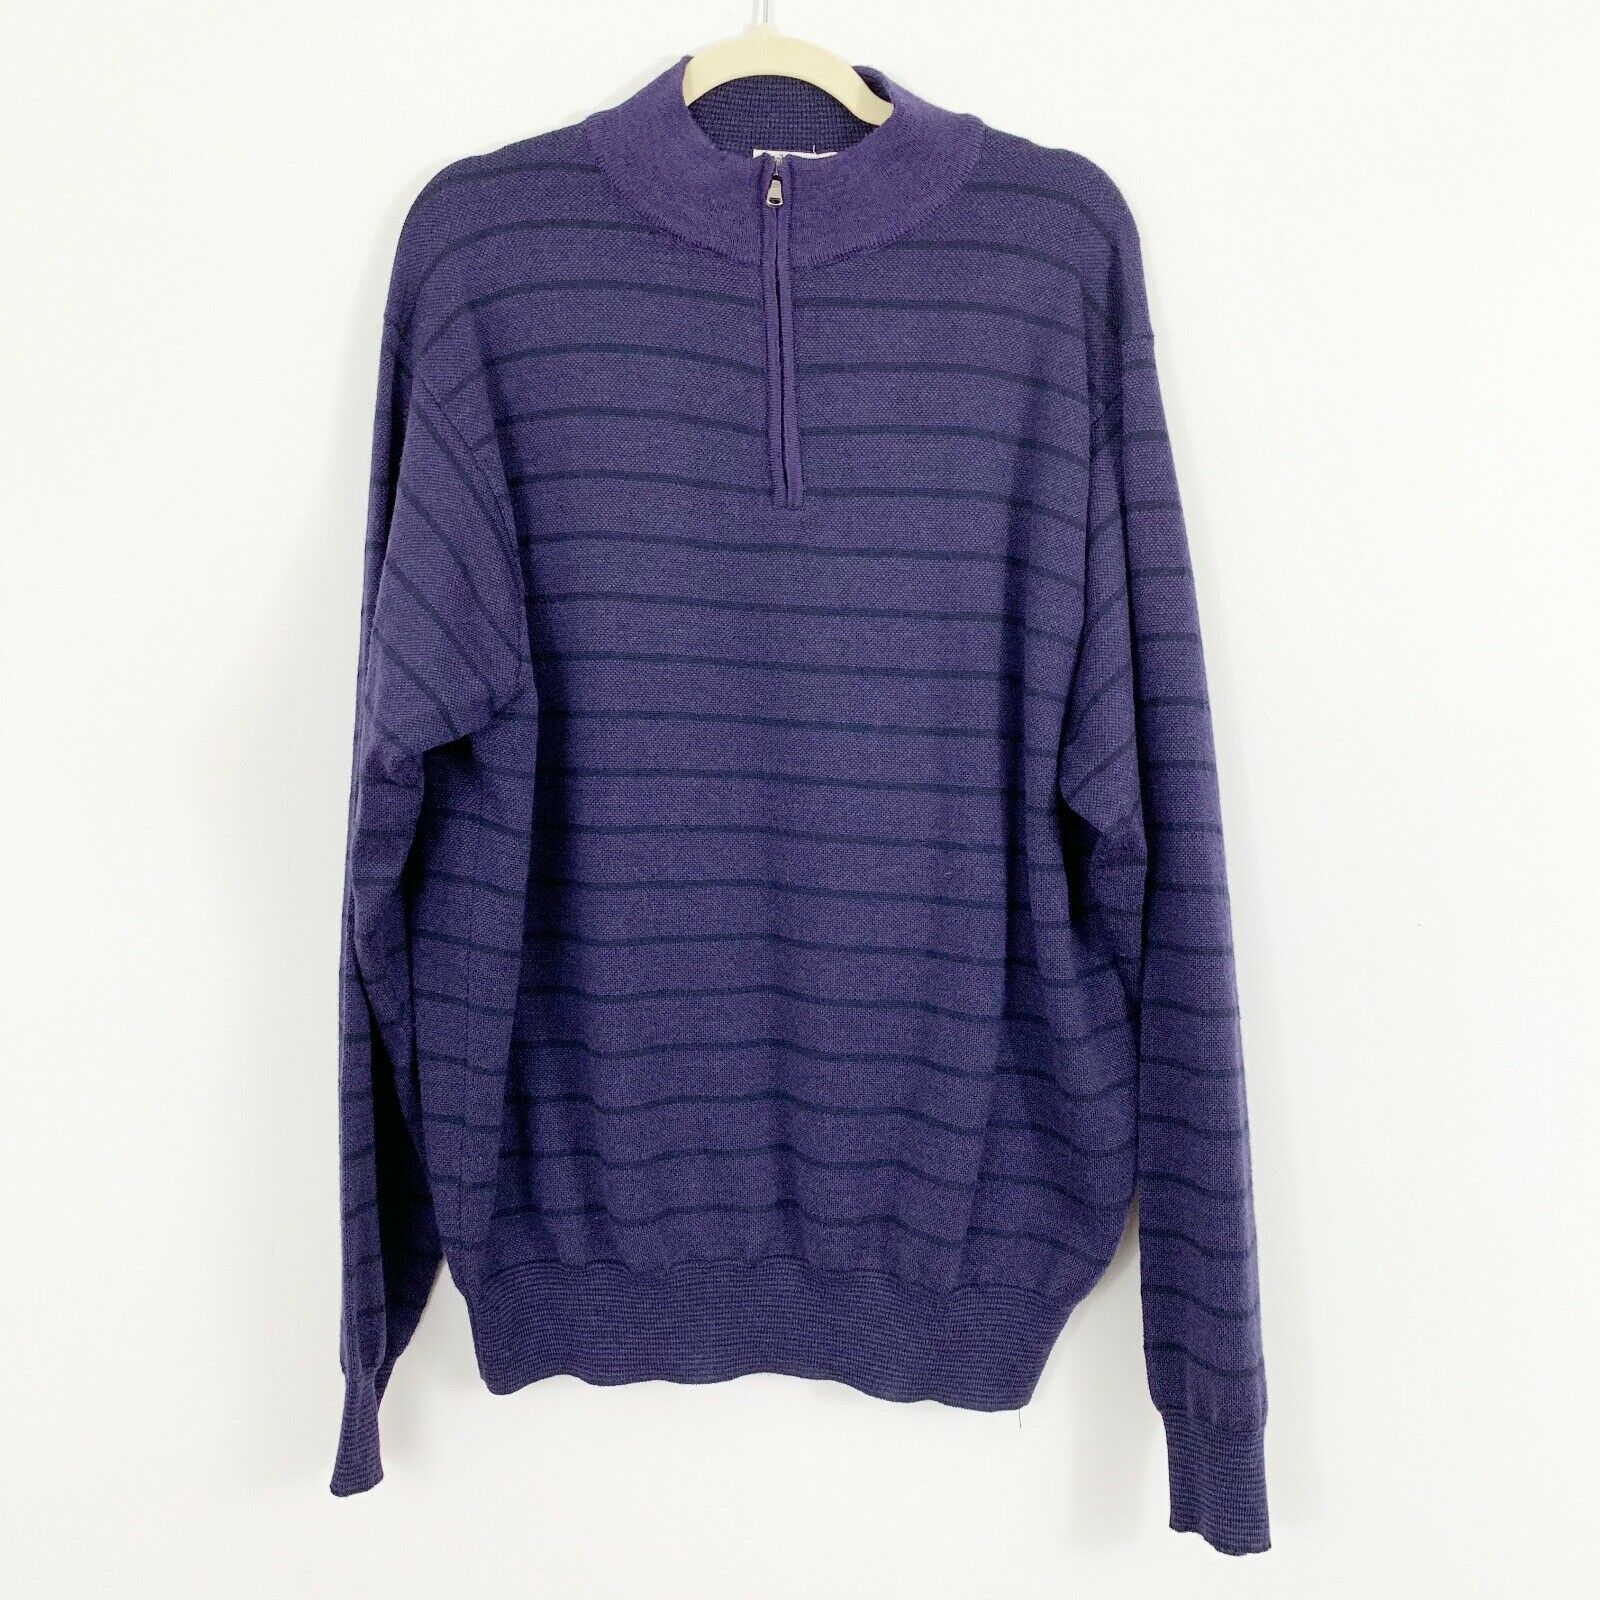 Peter Millar Purple Striped Merino Wool Sweater Size XL Extra Large 1 4 Zip